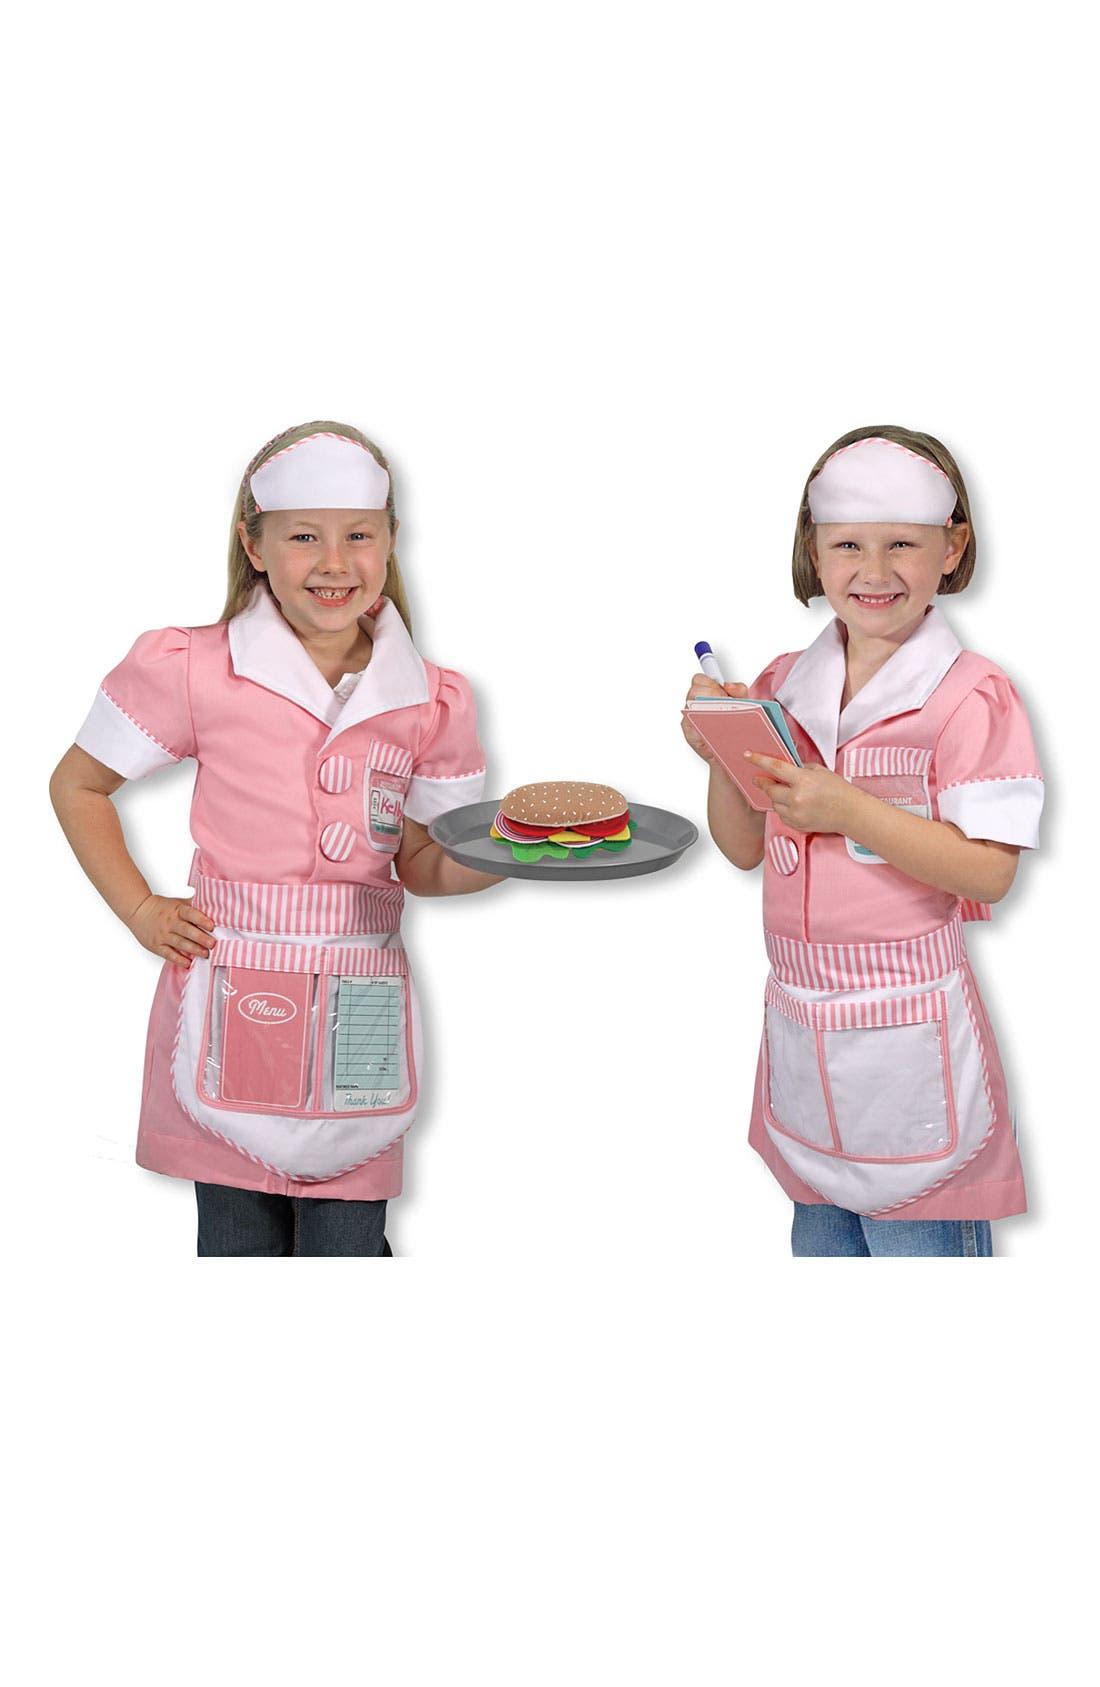 'Waitress' Costume,                             Main thumbnail 1, color,                             960